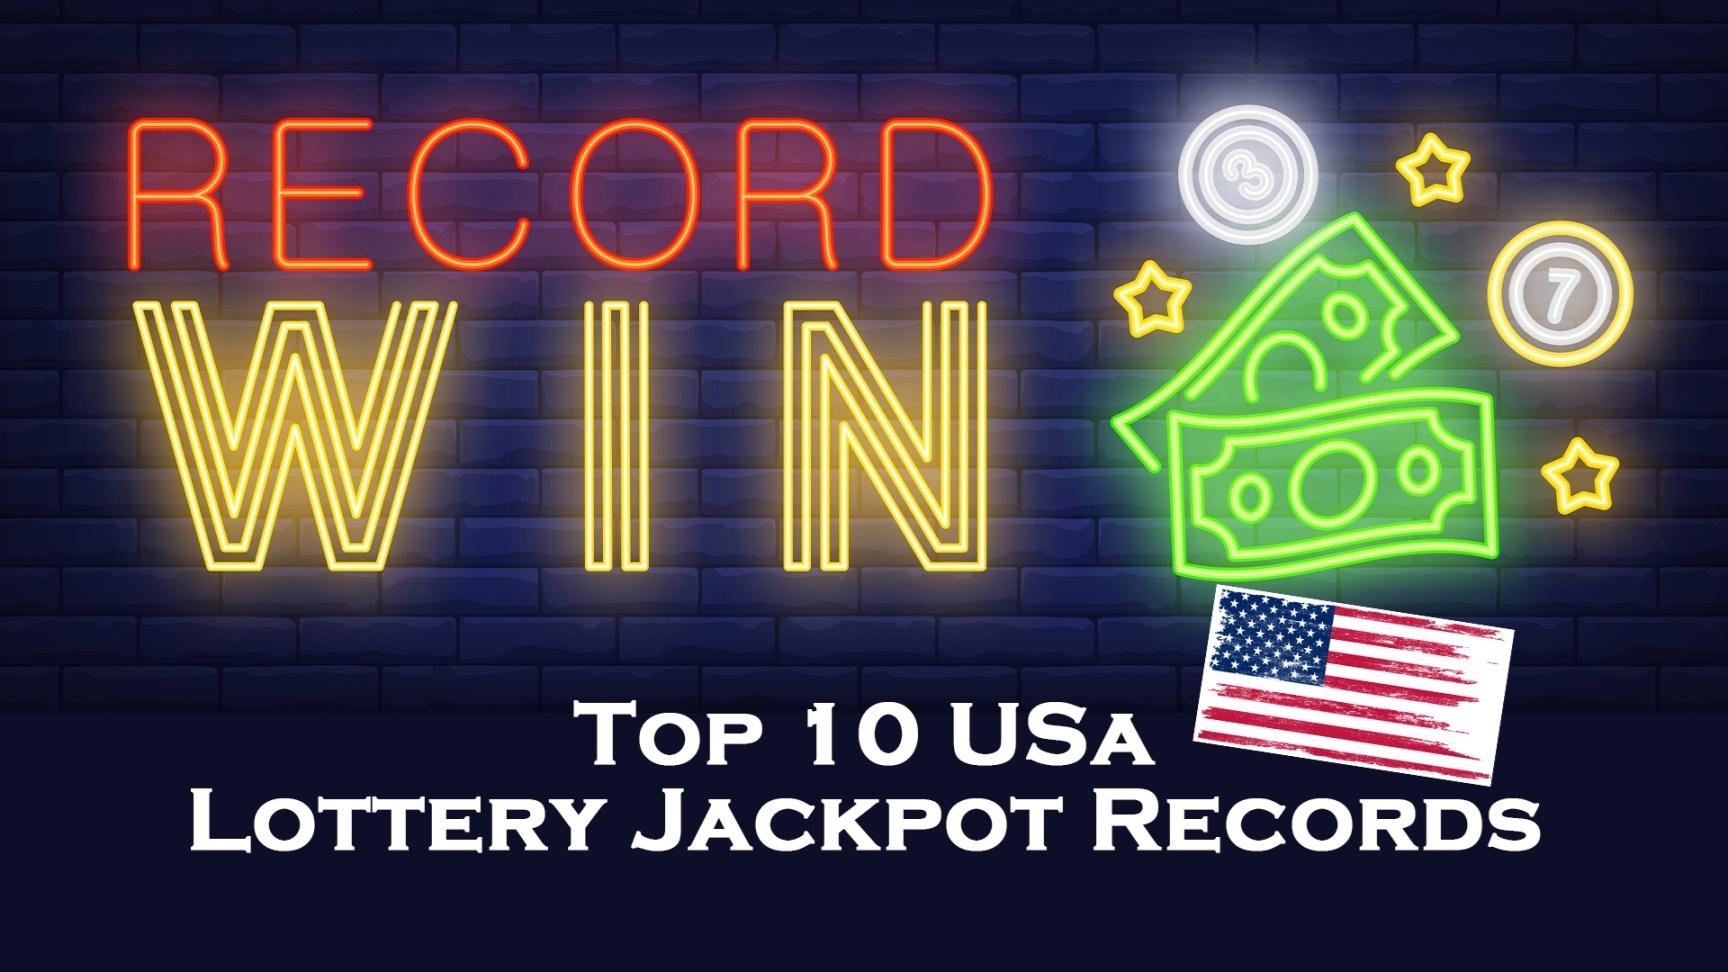 Top 10 USA lottery jackpot records